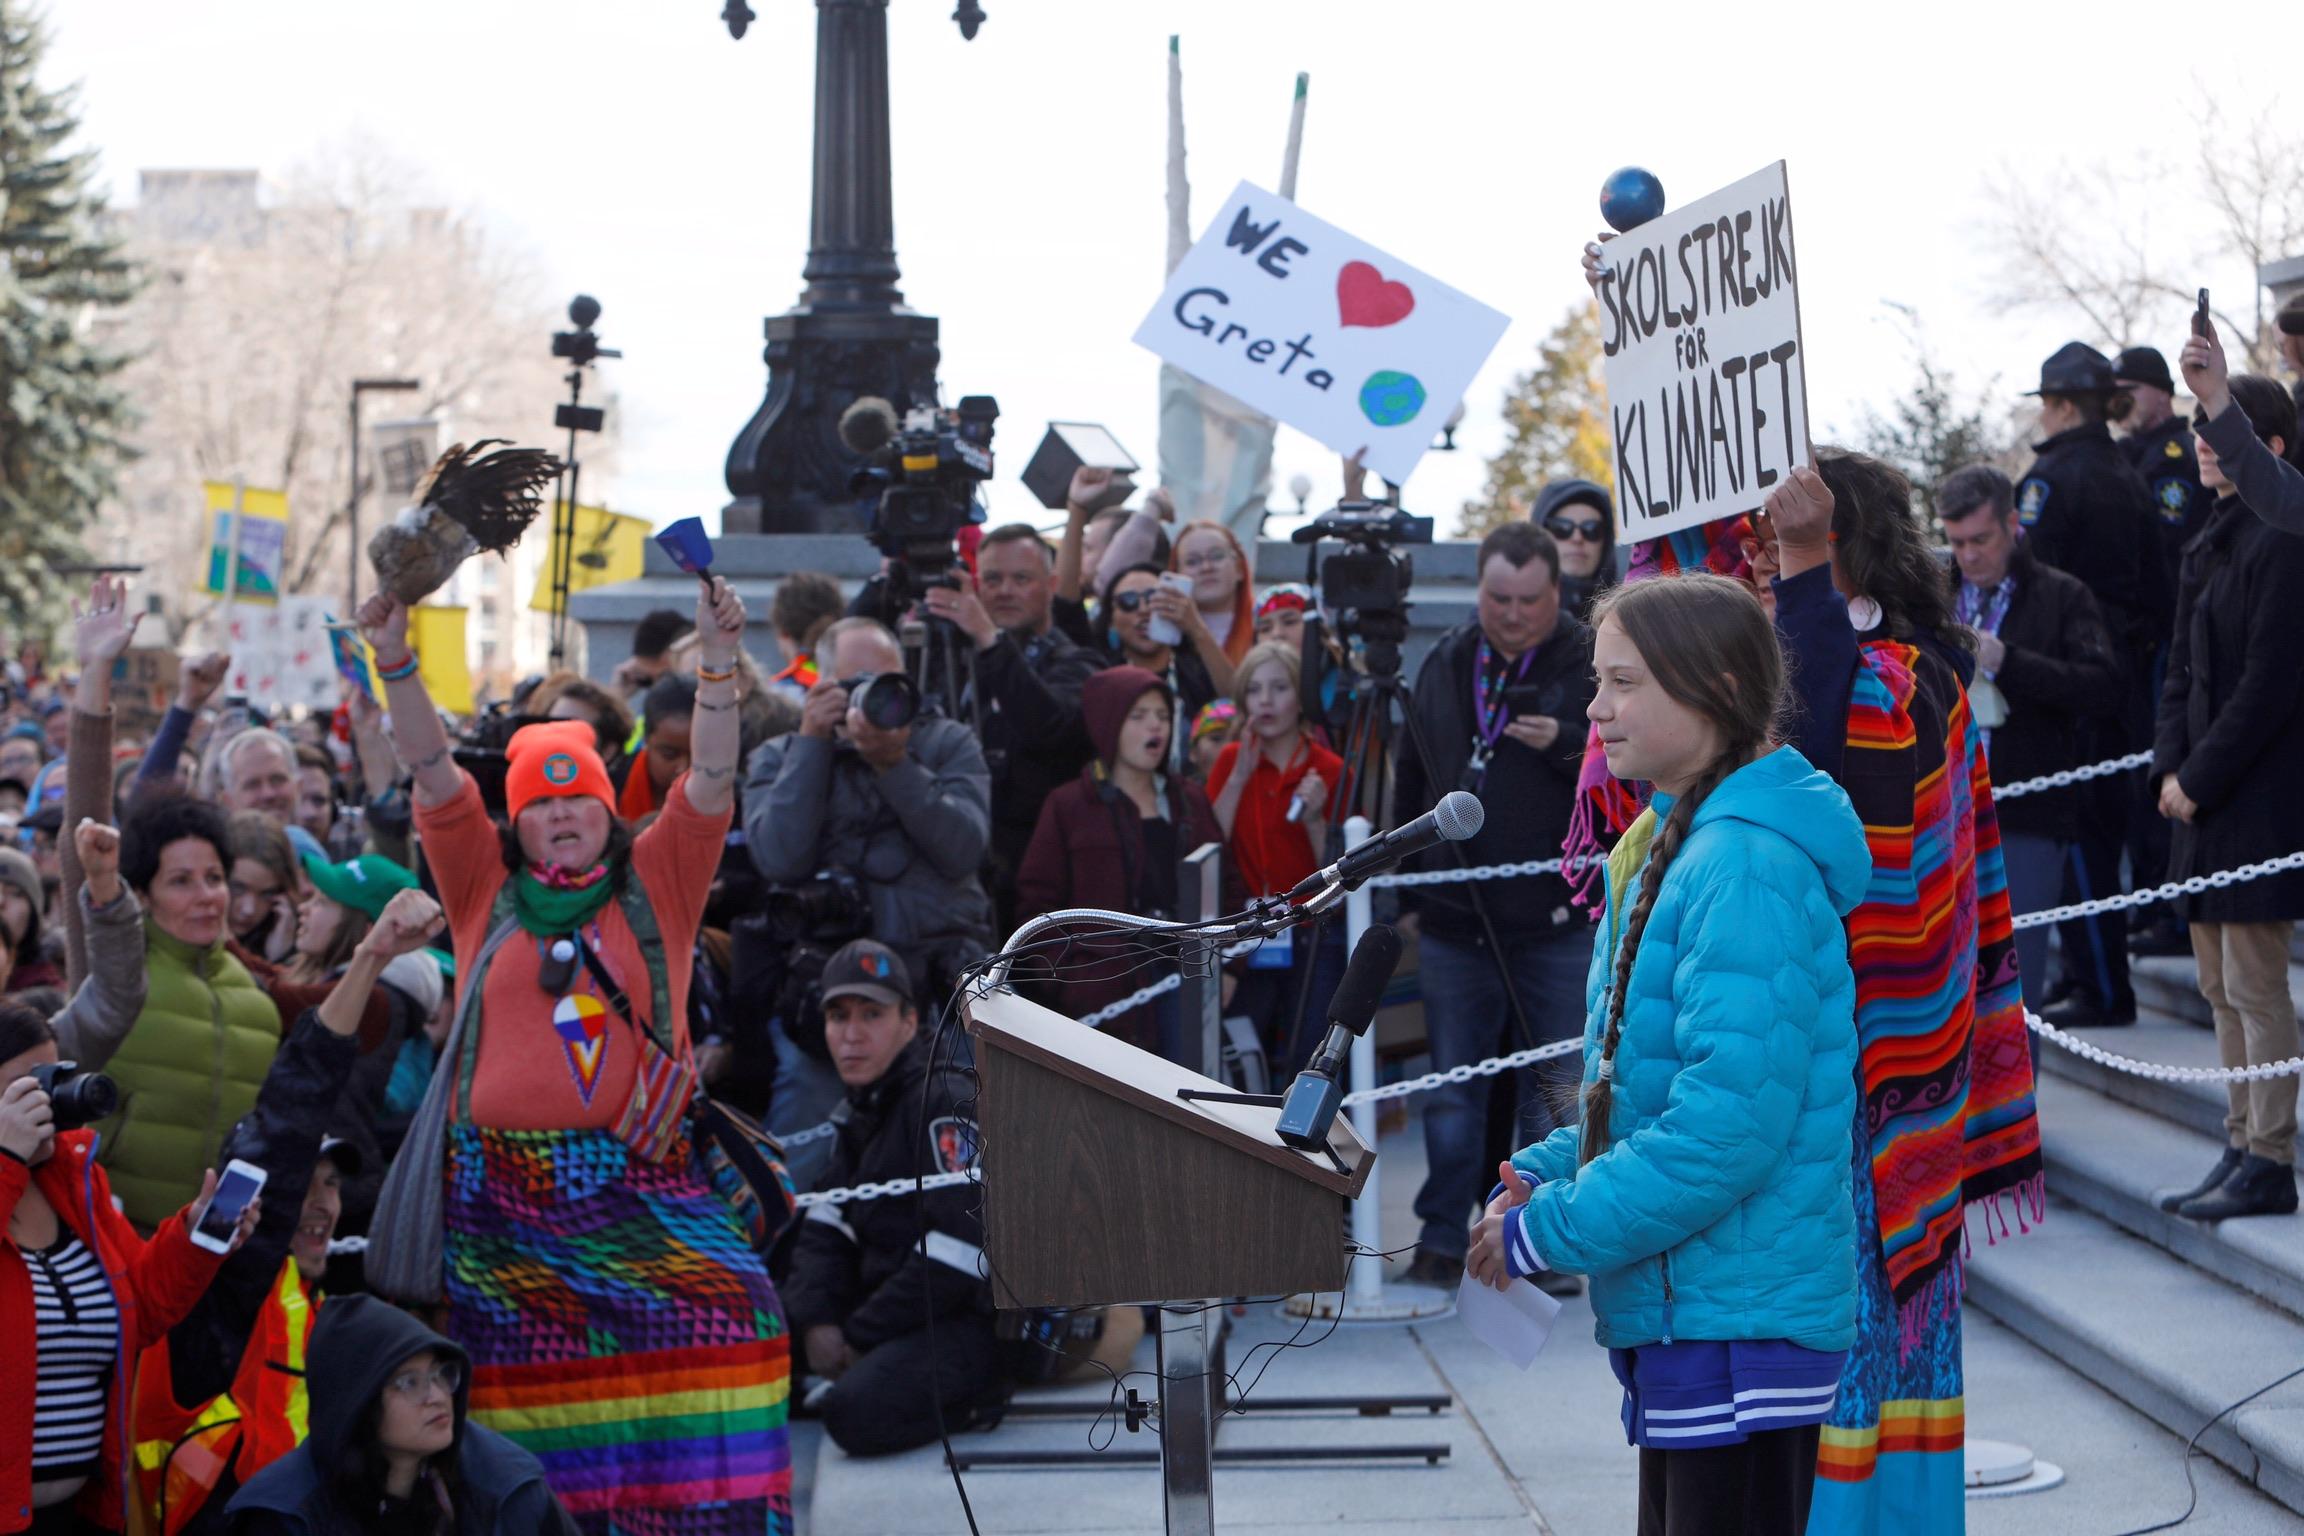 Swedish climate change teen activist Greta Thunberg speaks during a climate strike at the Alberta Legislature in Edmonton, Alberta, Canada October 18, 2019. REUTERS/Amber Bracken